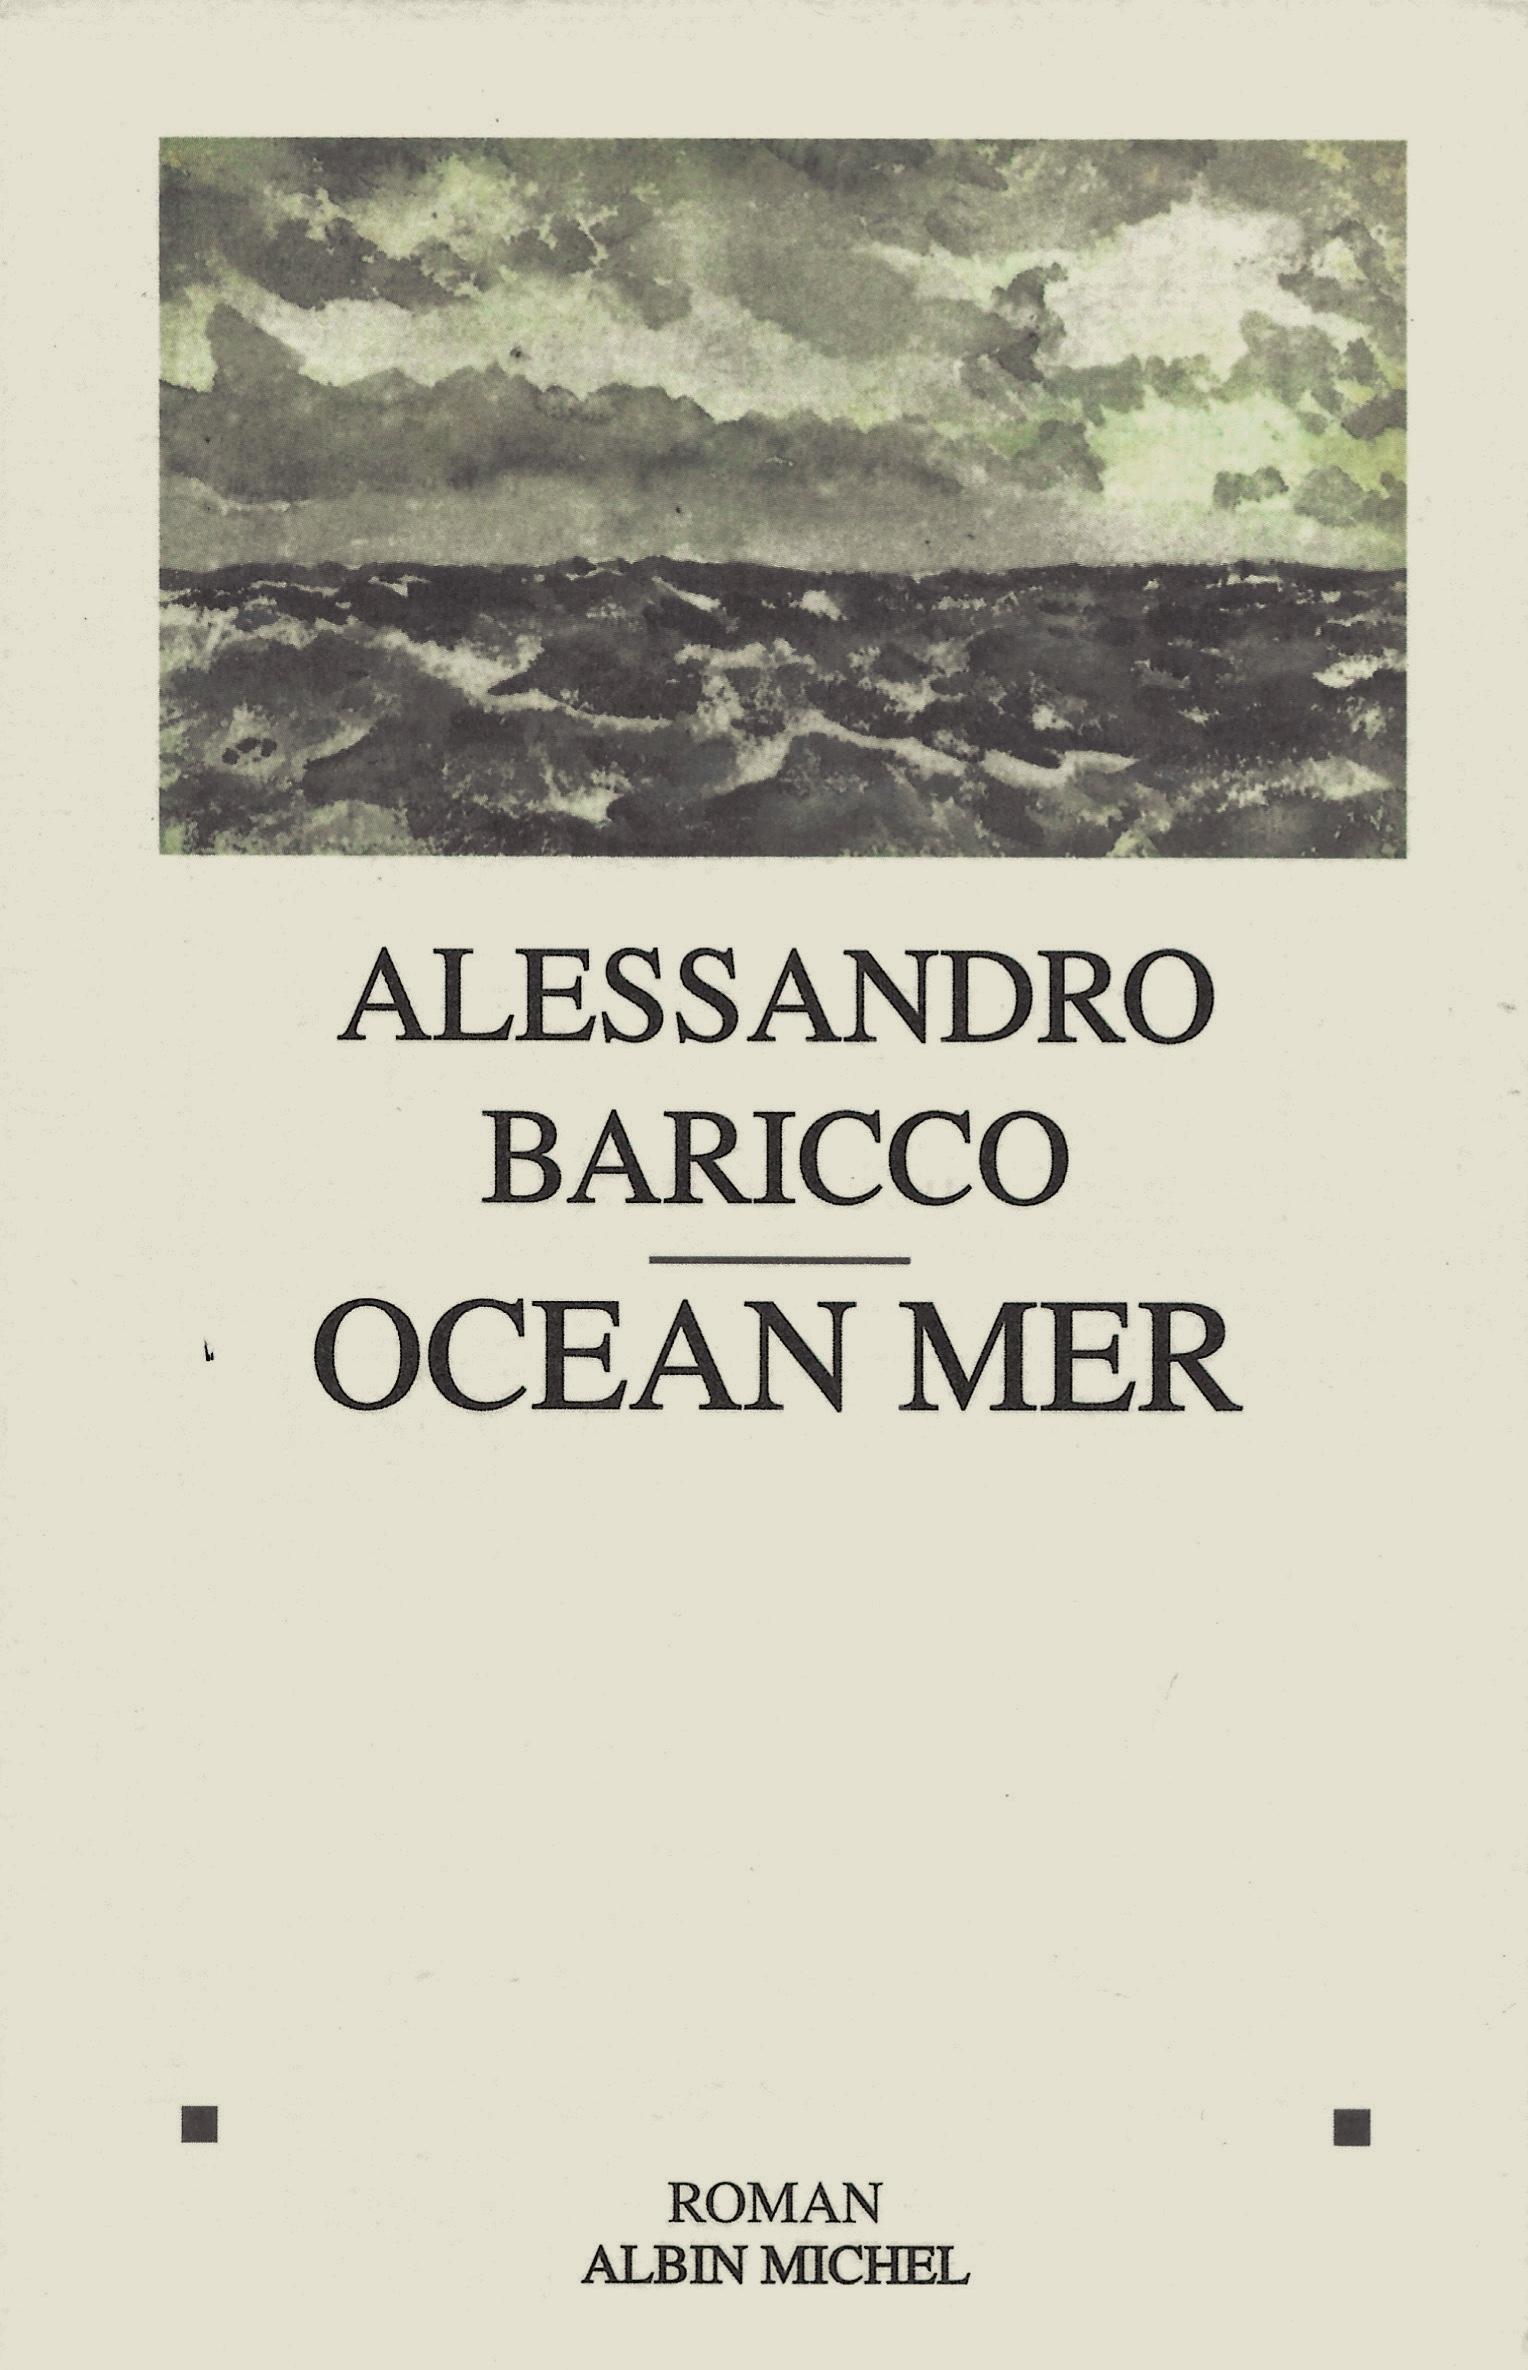 Alessandro Baricco, Océan mer, 1998, couverture